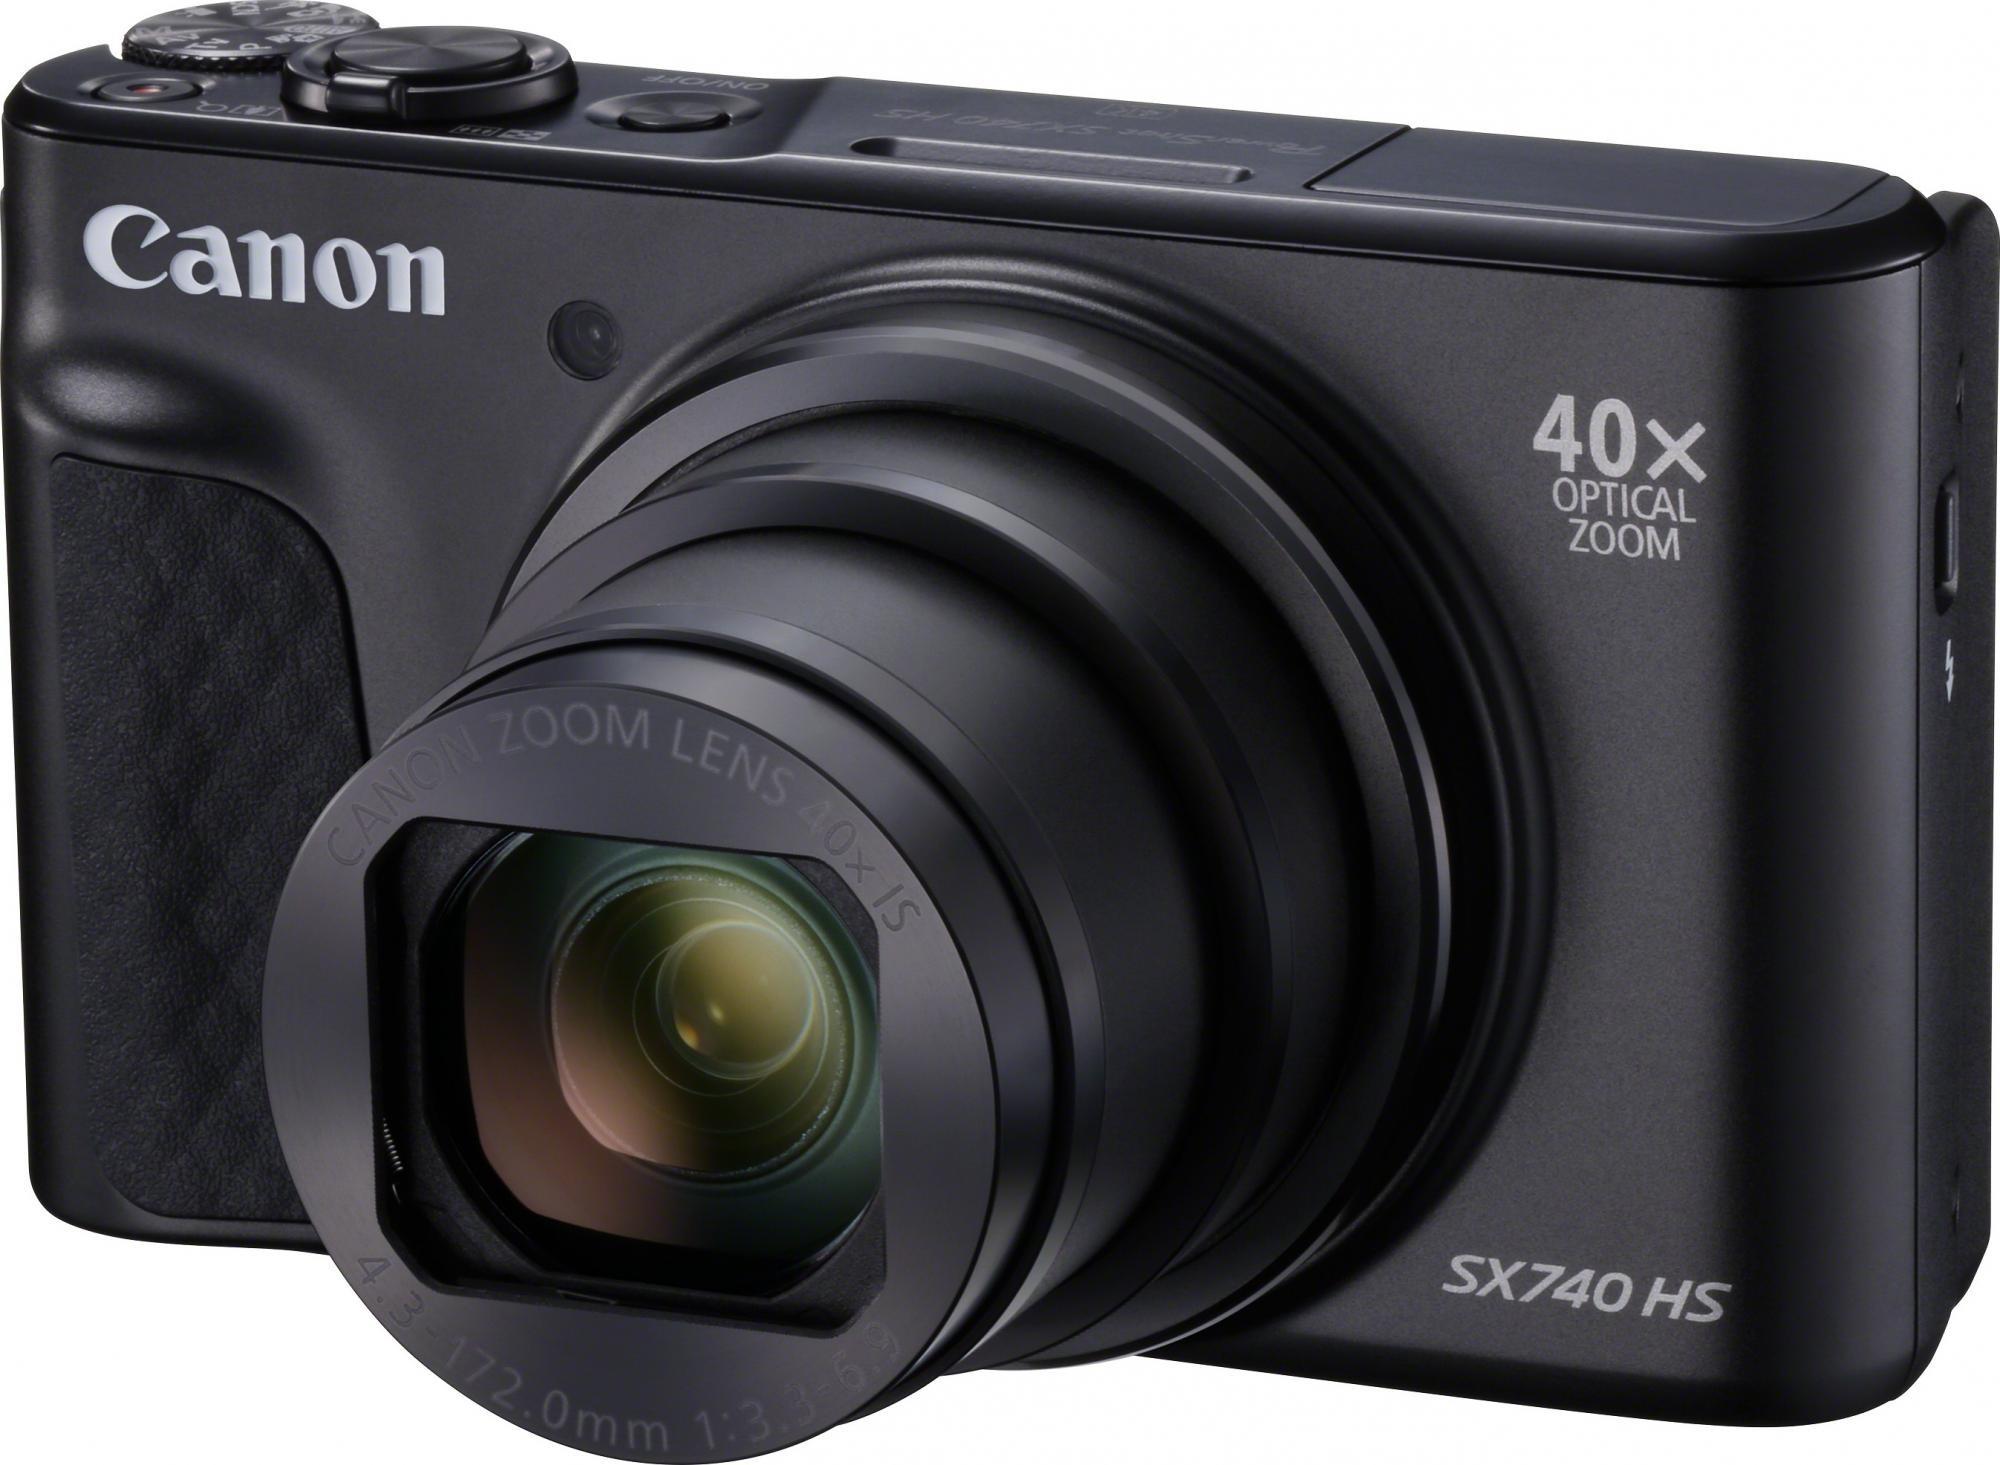 Aparat fotograficzny dla seniora Canon